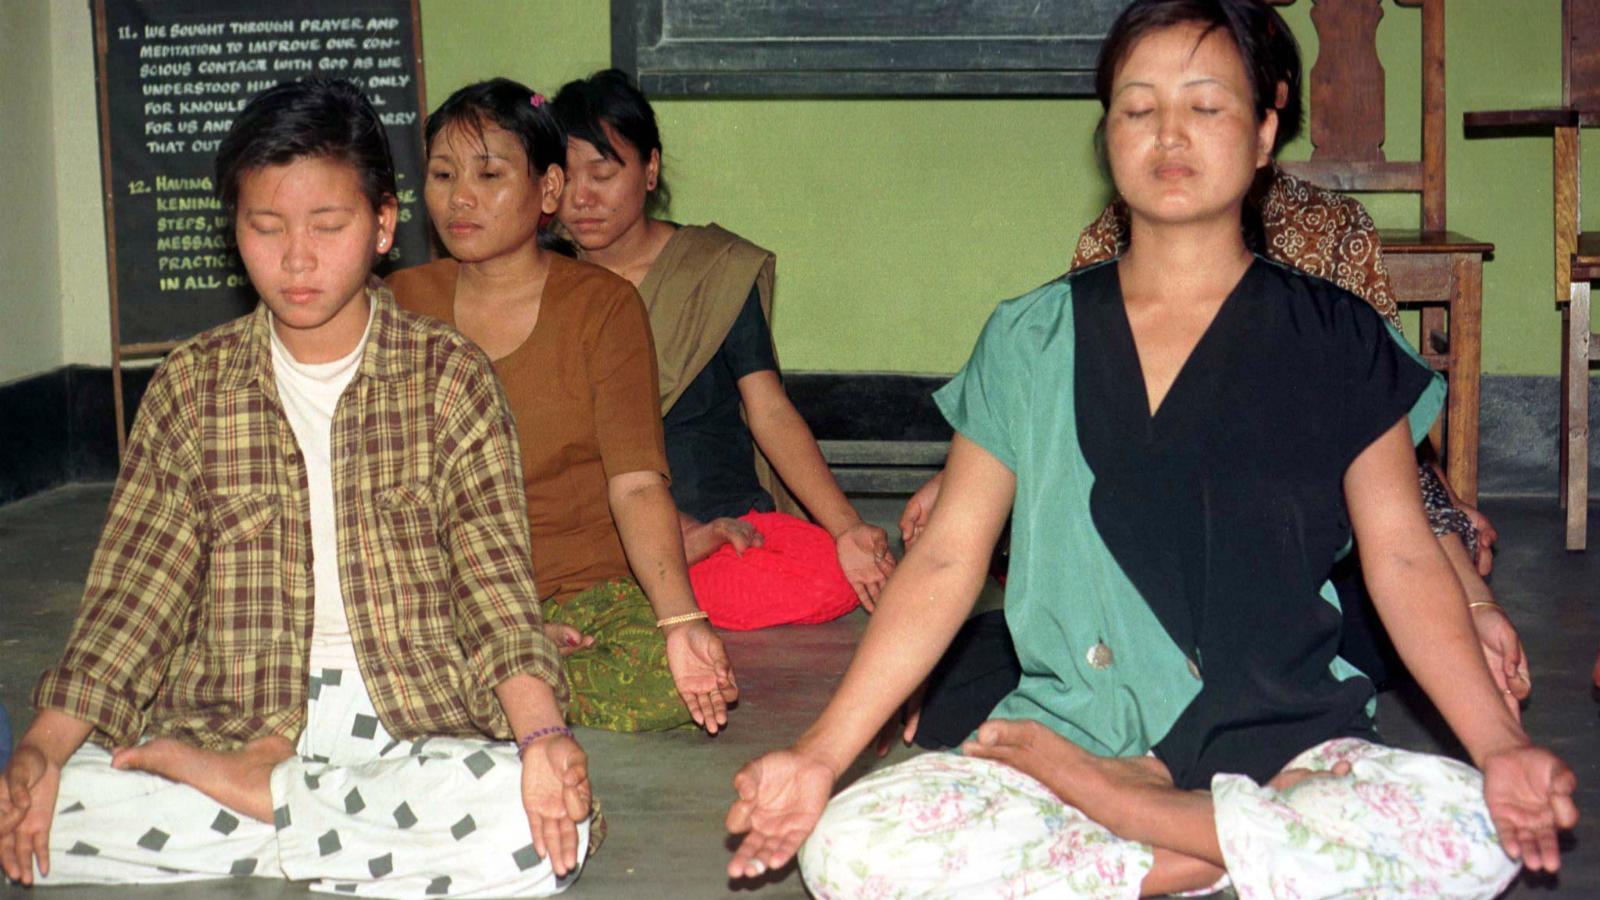 Tech fatigue is nudging Indian millennials towards vipassana meditation